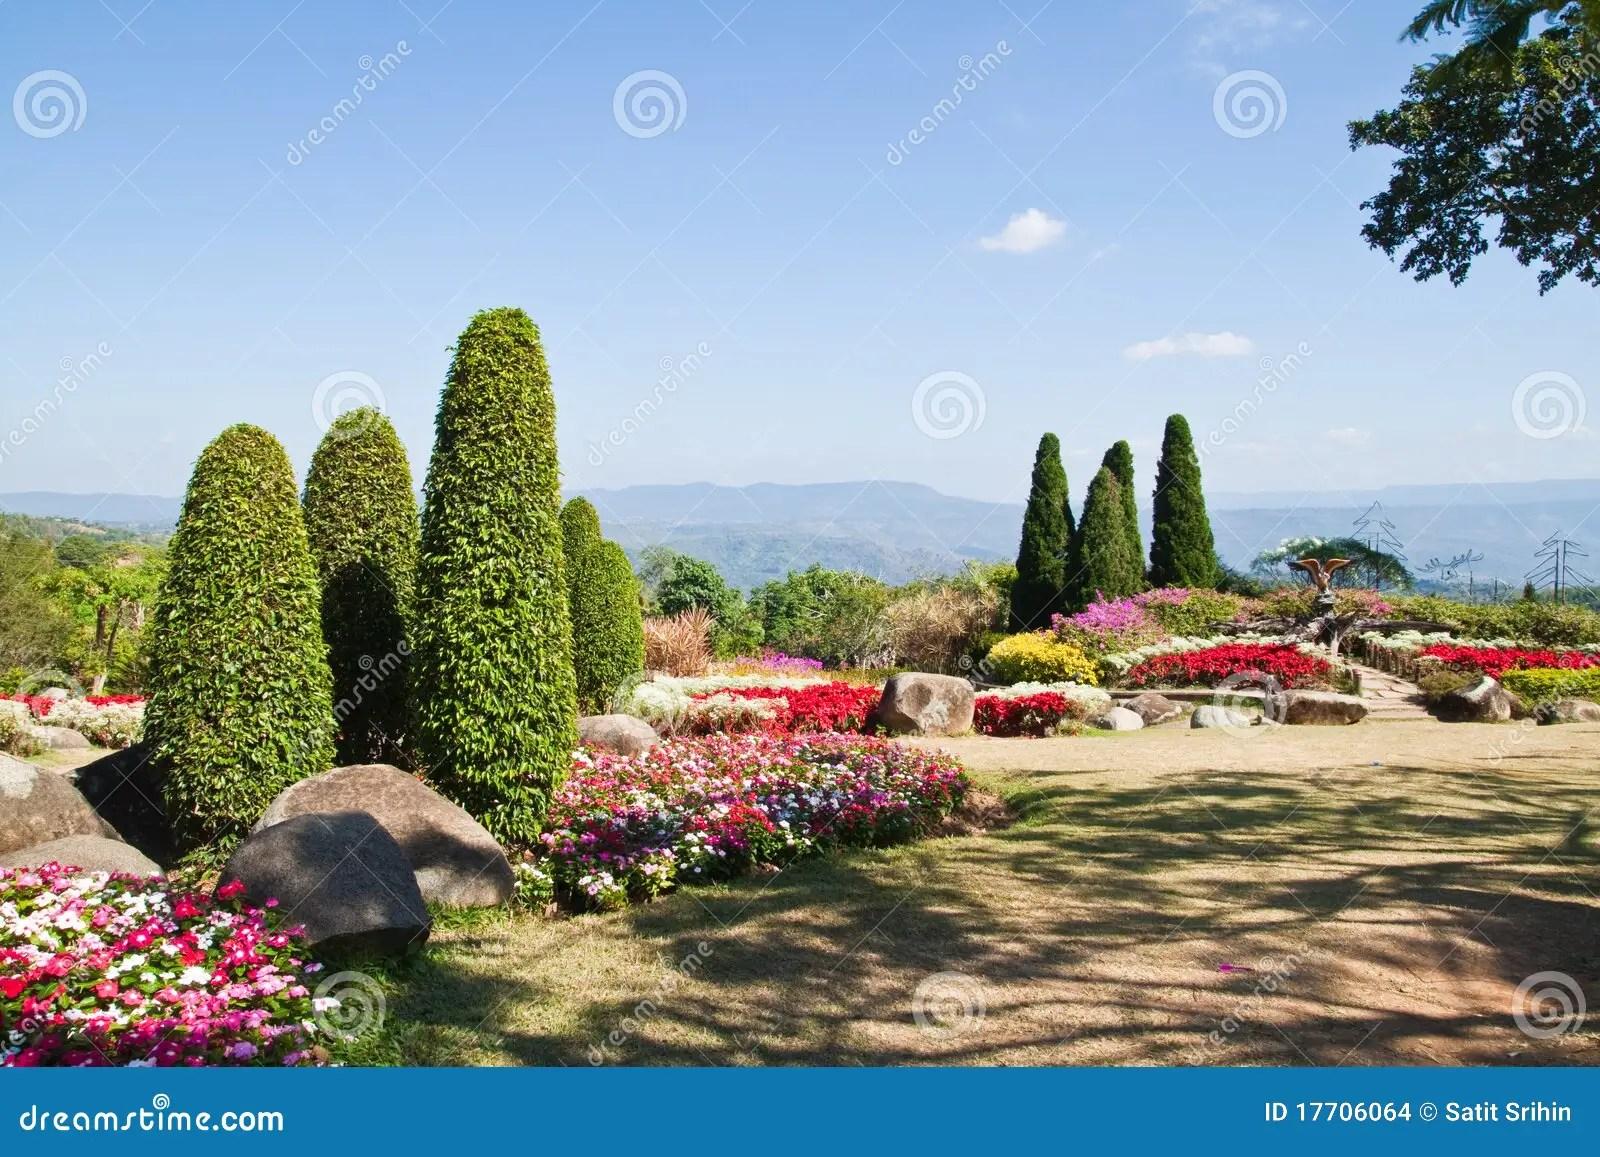 Blue Garden Stones